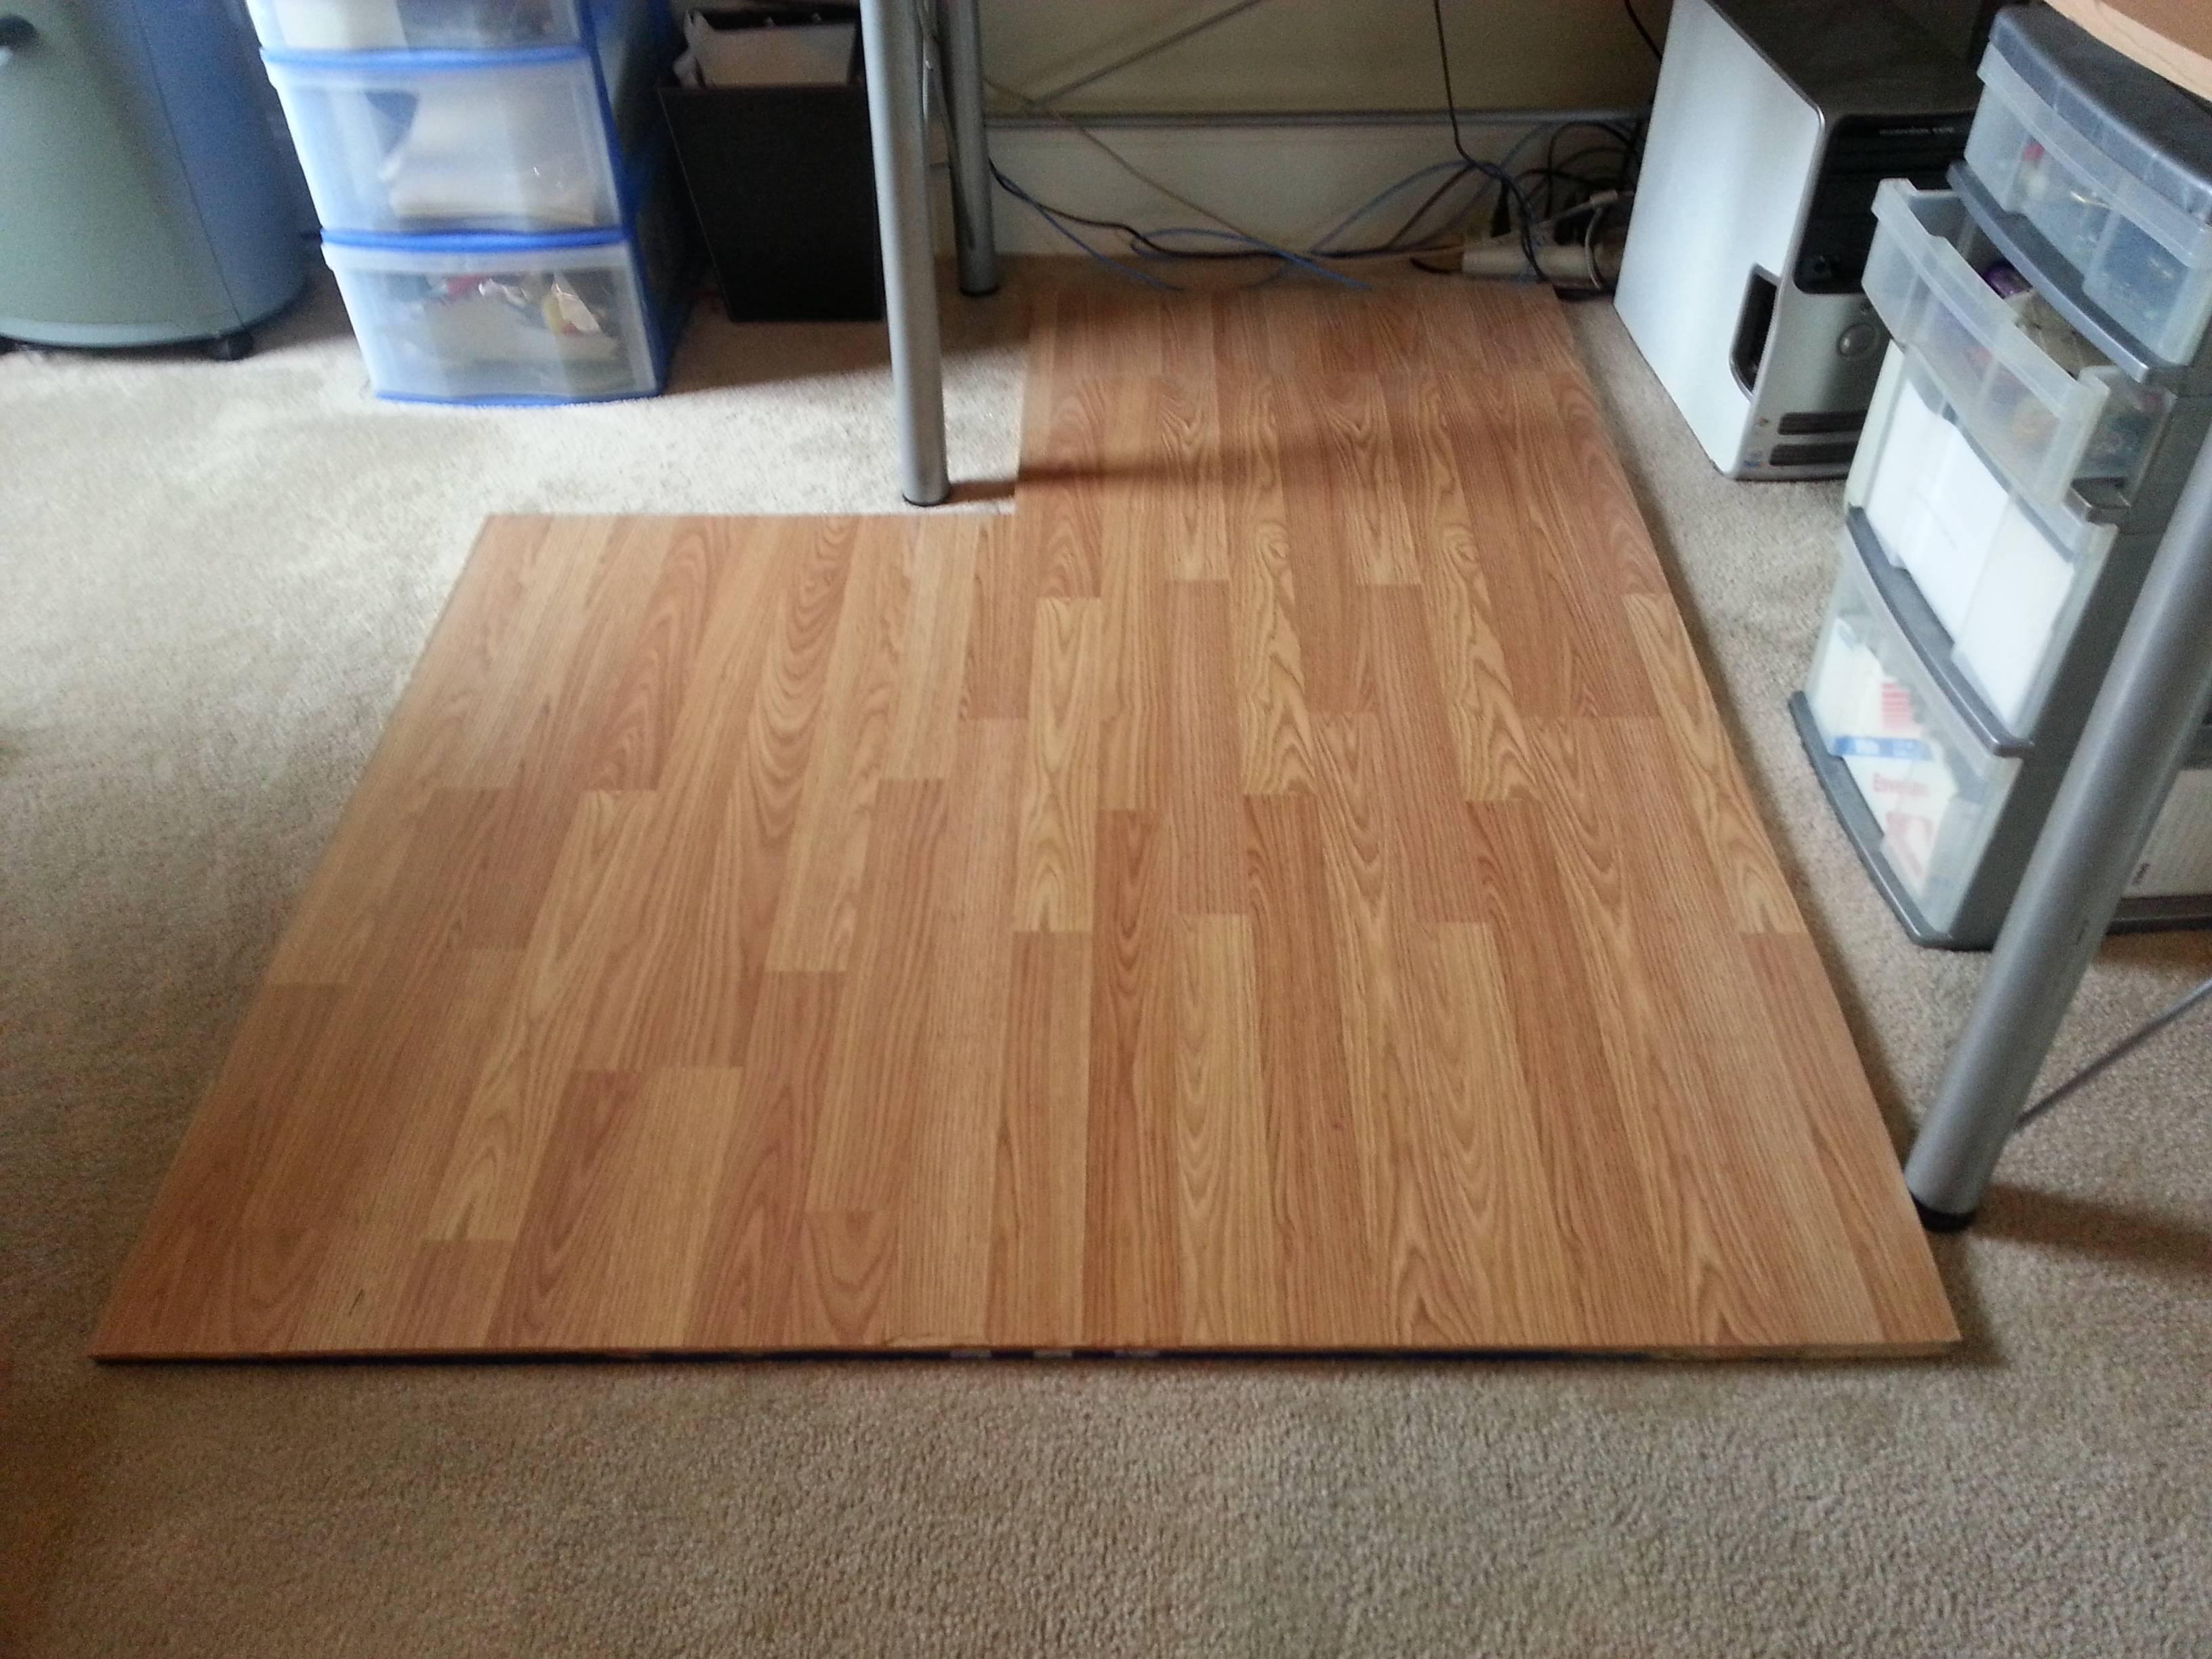 Laminate Wood Flooring Diy Photo 8